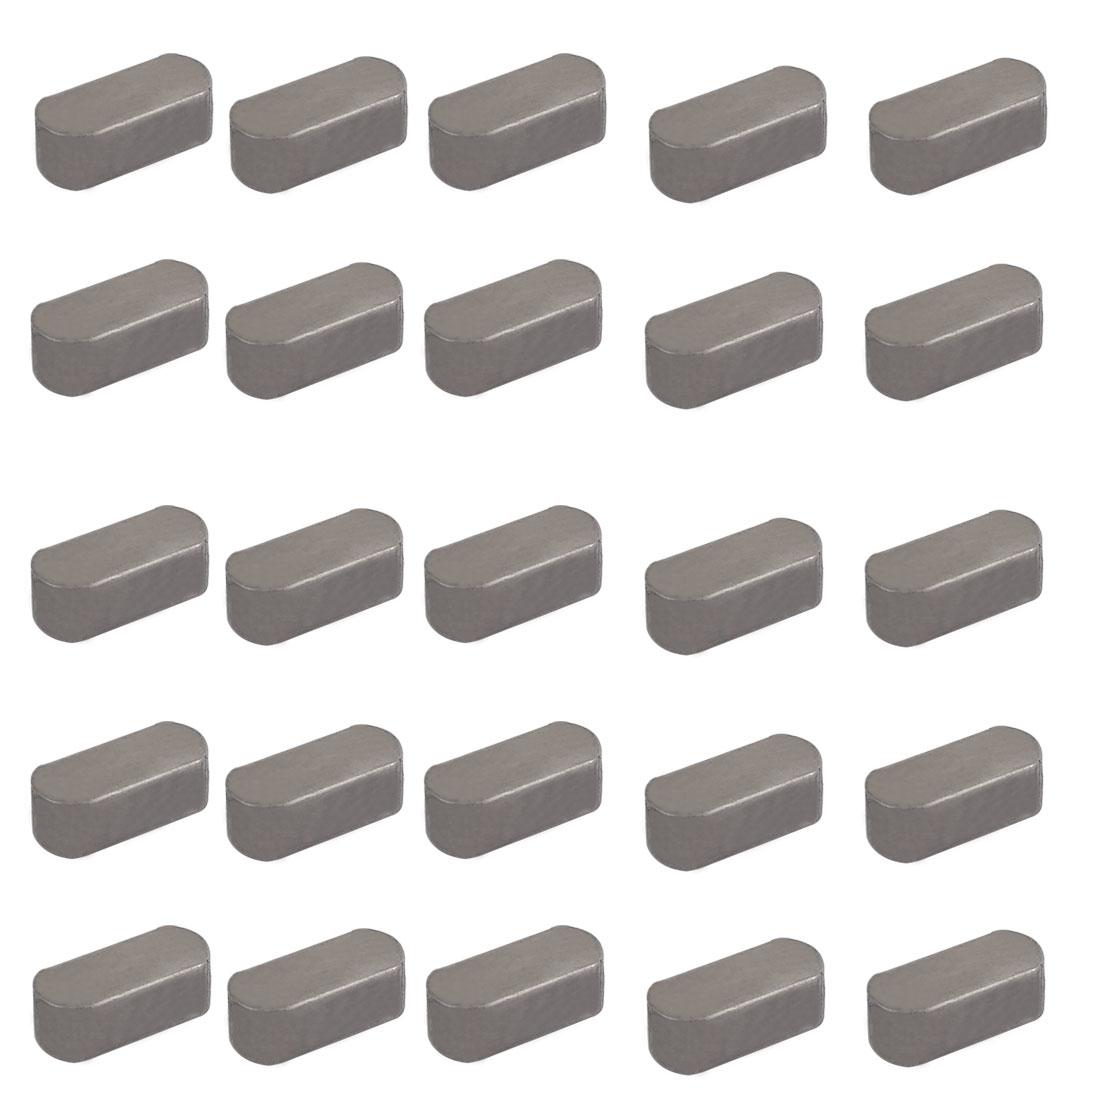 20mmx8mmx7mm Carbon Steel Key Stock To Lock Pulleys 25pcs